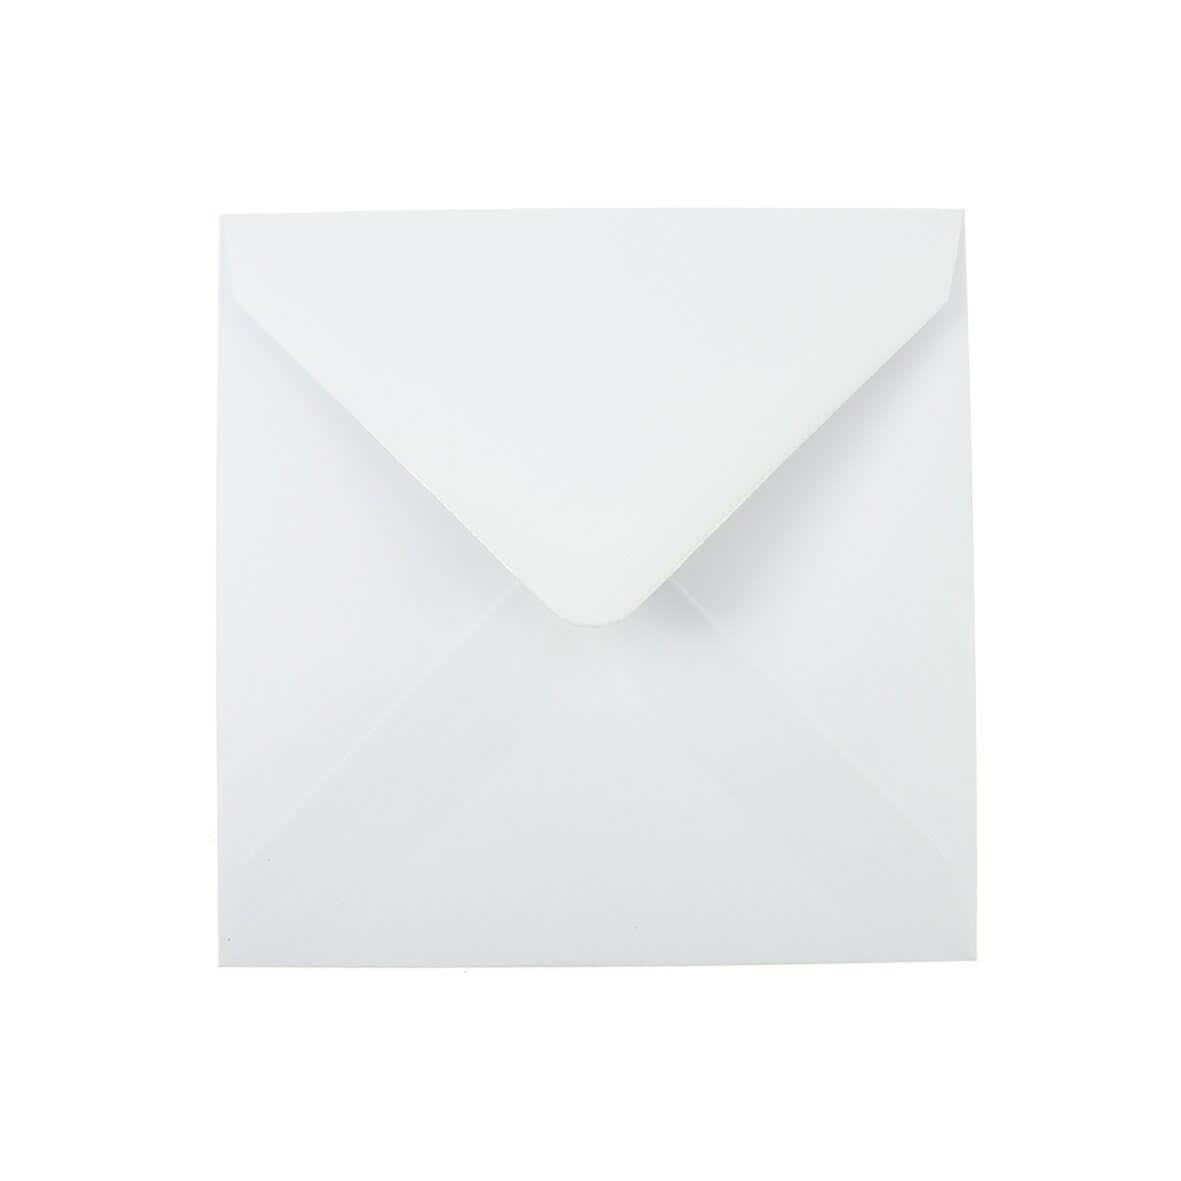 Plain White Small Square 130mm Envelope